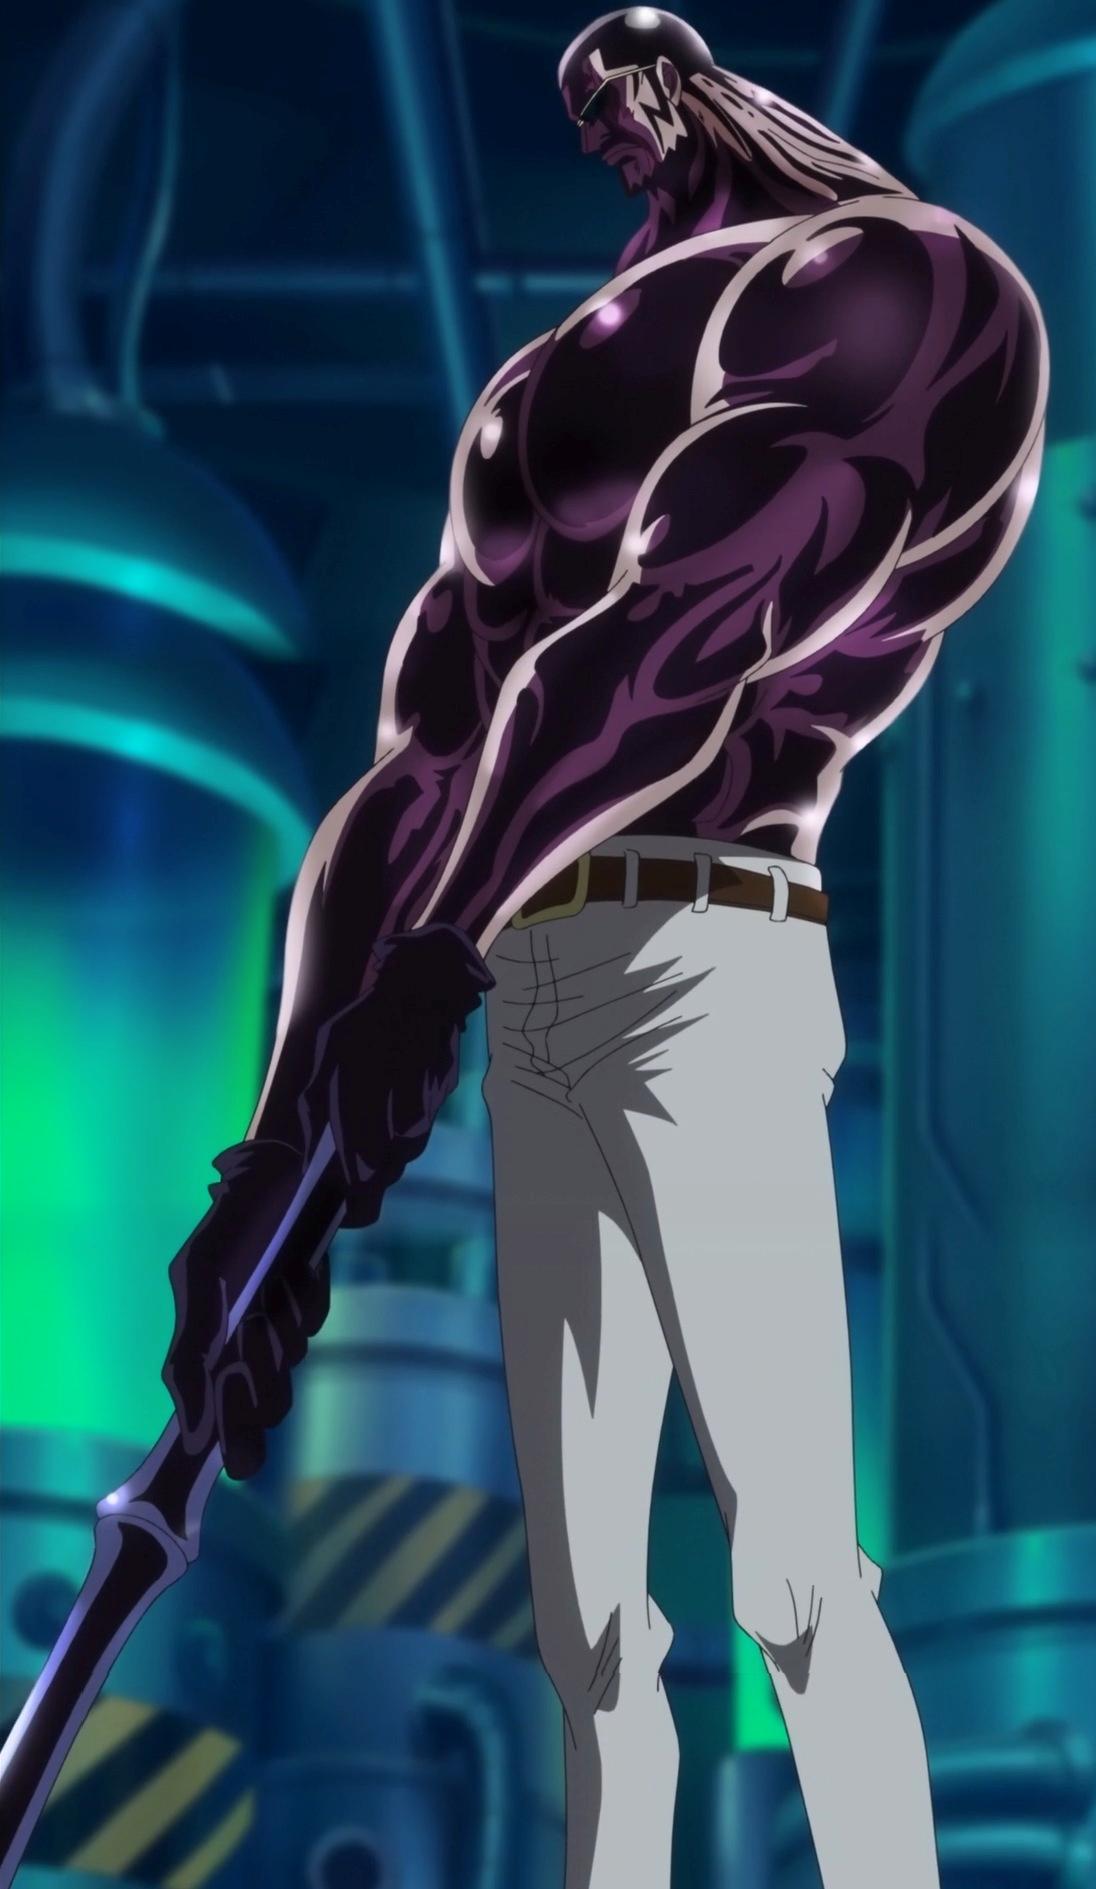 Image - Vergo Full Body Haki.png - Fairy One Piece Tail Wiki